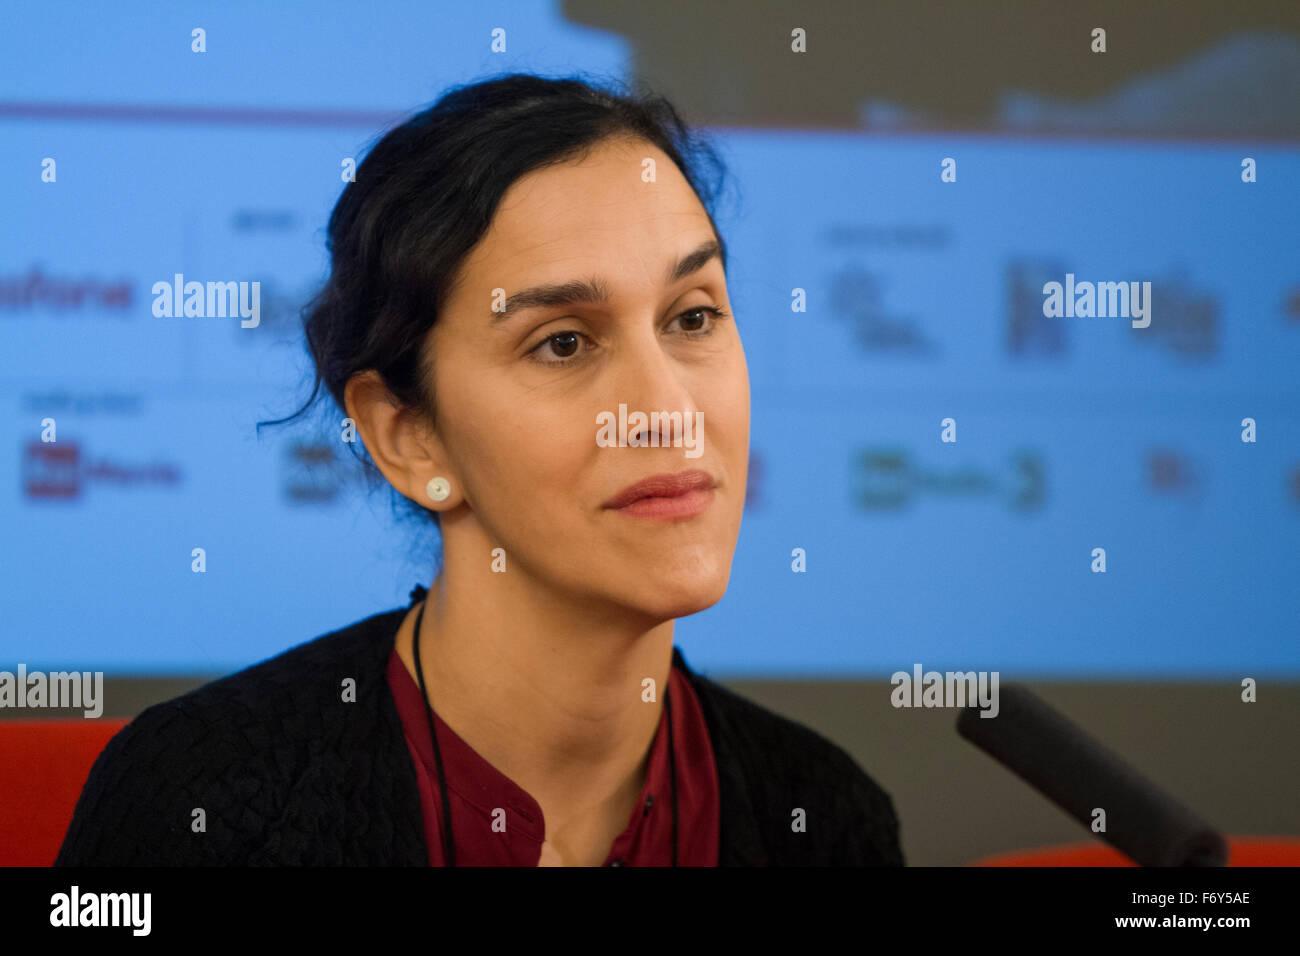 Turin, Italy. 21st Nov, 2015. British film director Sarah Gavron during press conference at Torino Film Festival. Stock Photo